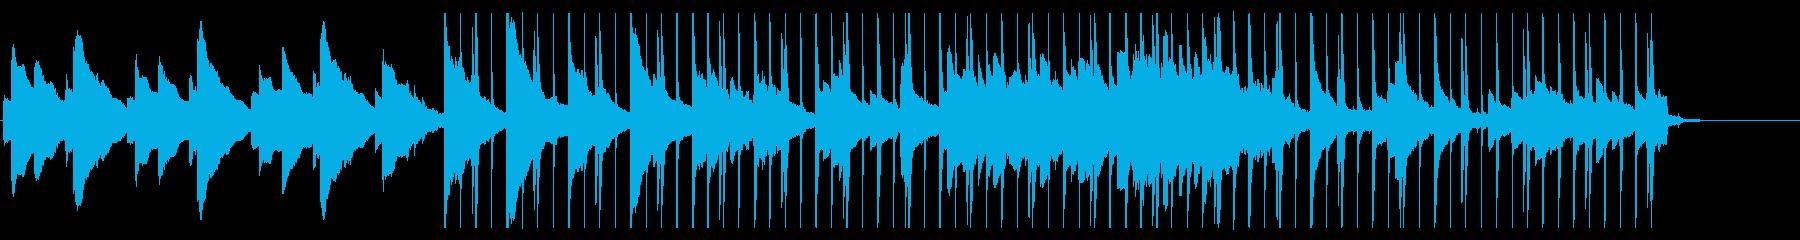 UKロックな電子ピアノに重めのキックの再生済みの波形